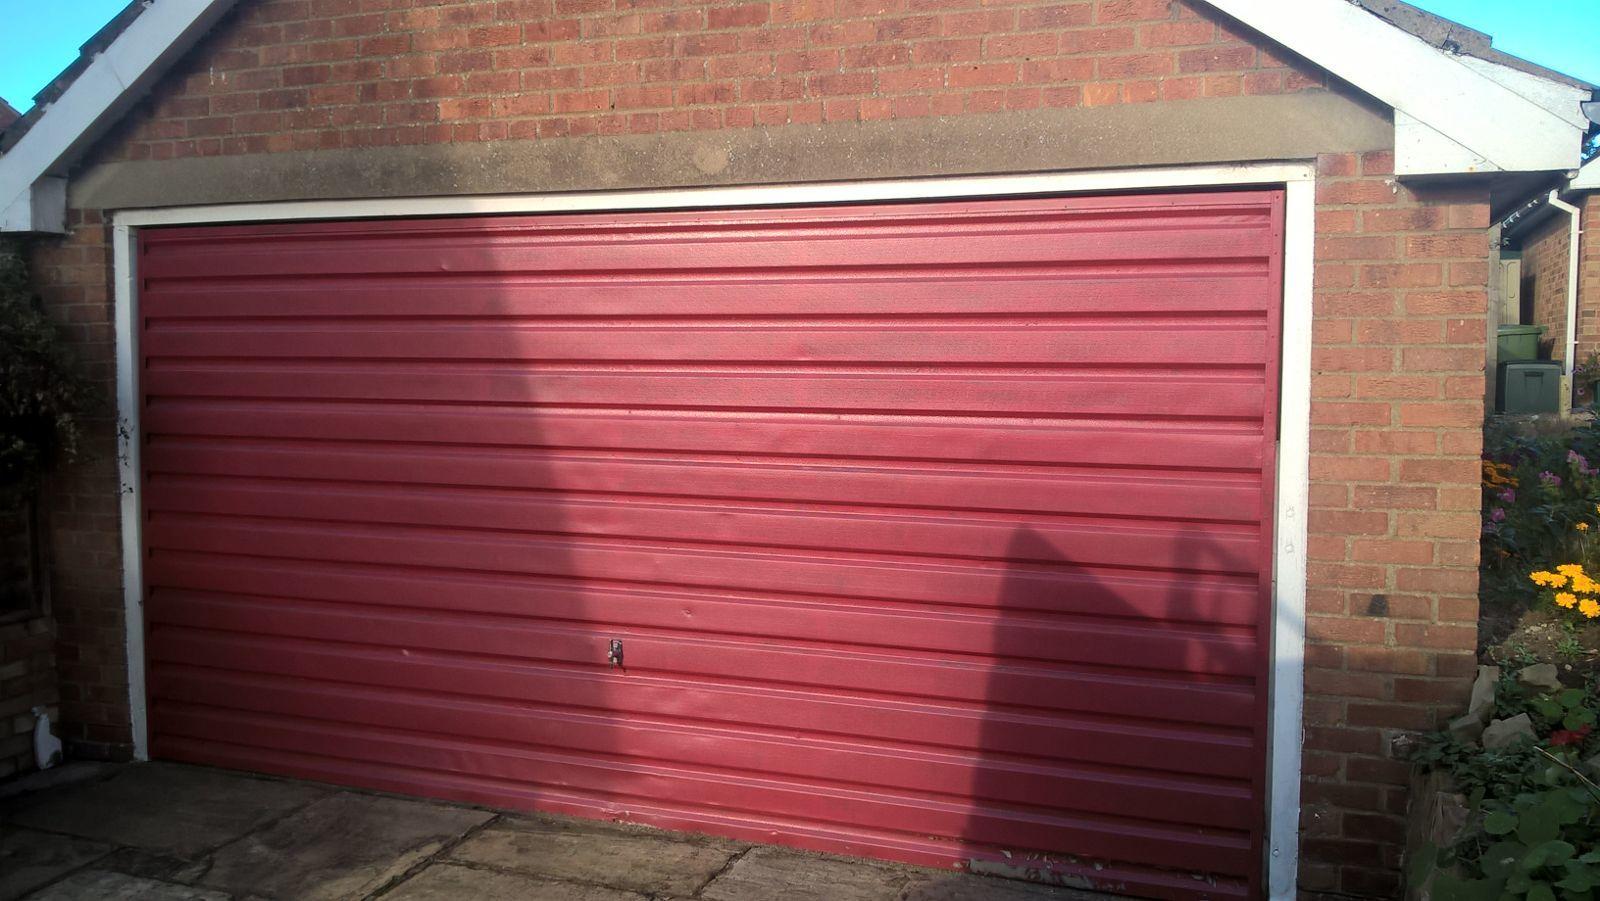 Insulated Ribbed Sectional Garage Door, Barnsley